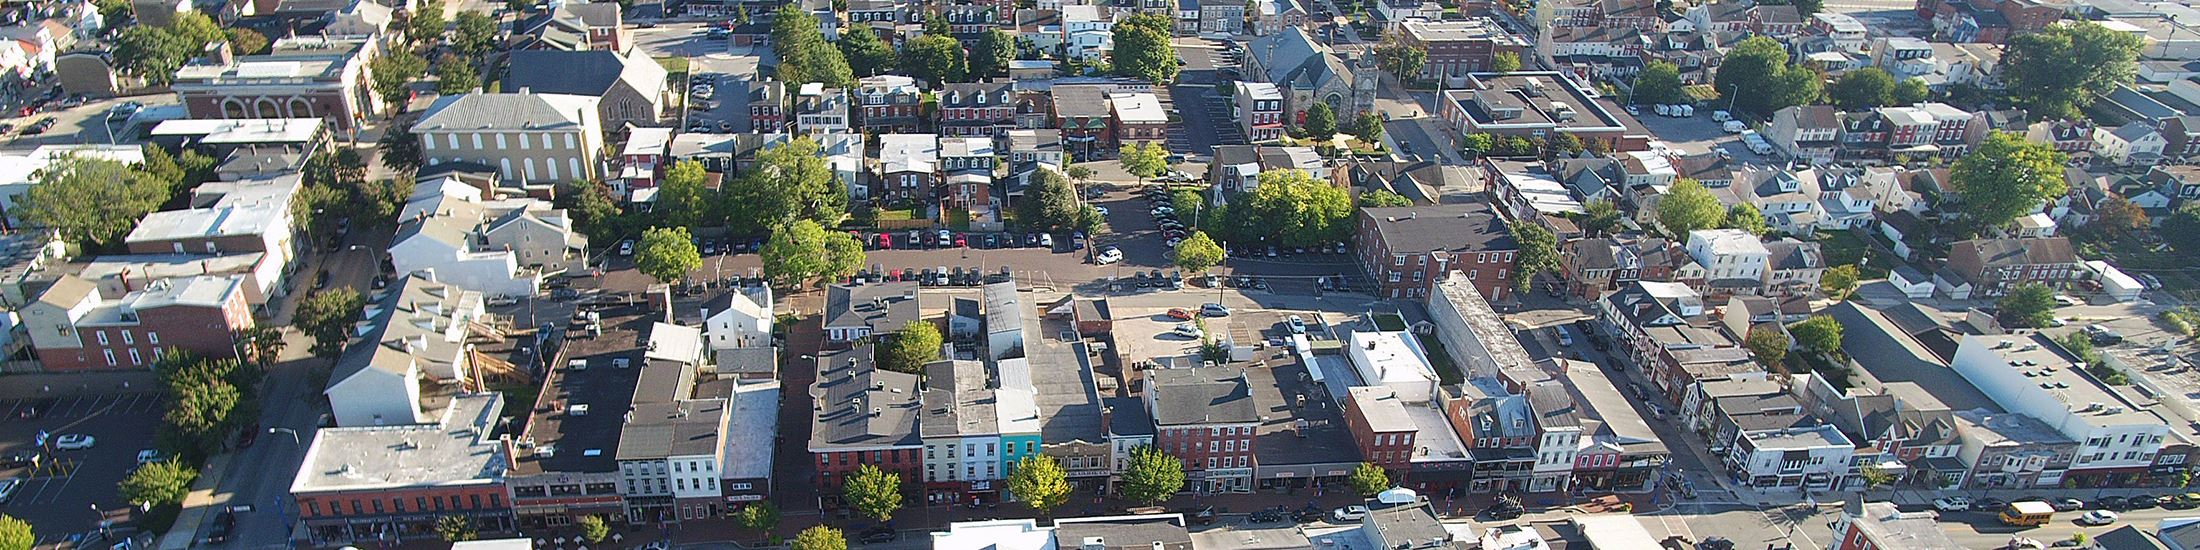 Parking | Phoenixville Borough, PA on